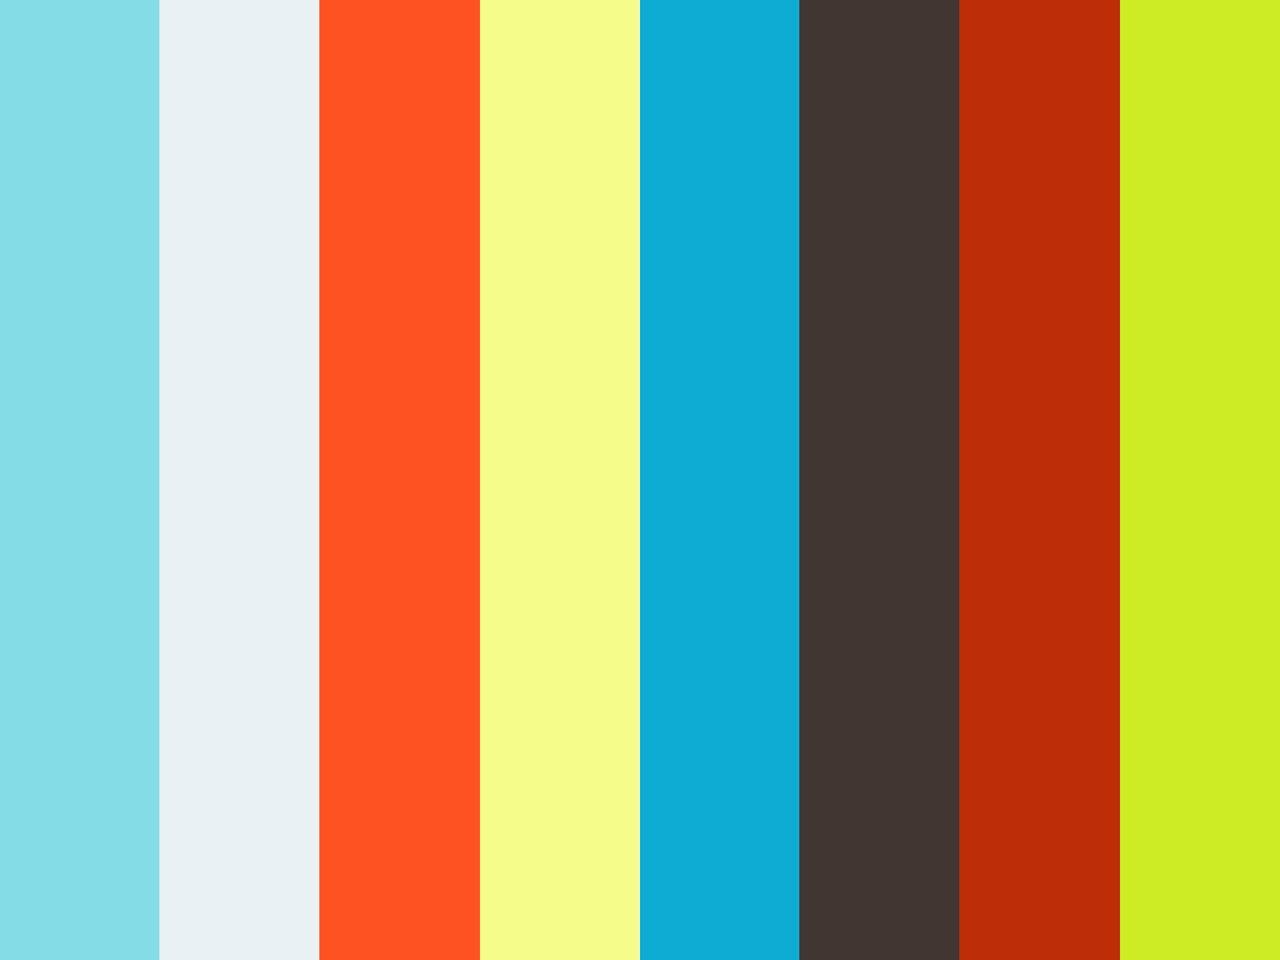 【SDE微電影】2015.05.30-晉宏 & 怡潔︱愛情微電影︱當日快剪快播SDE︱台北世貿33婚宴會館